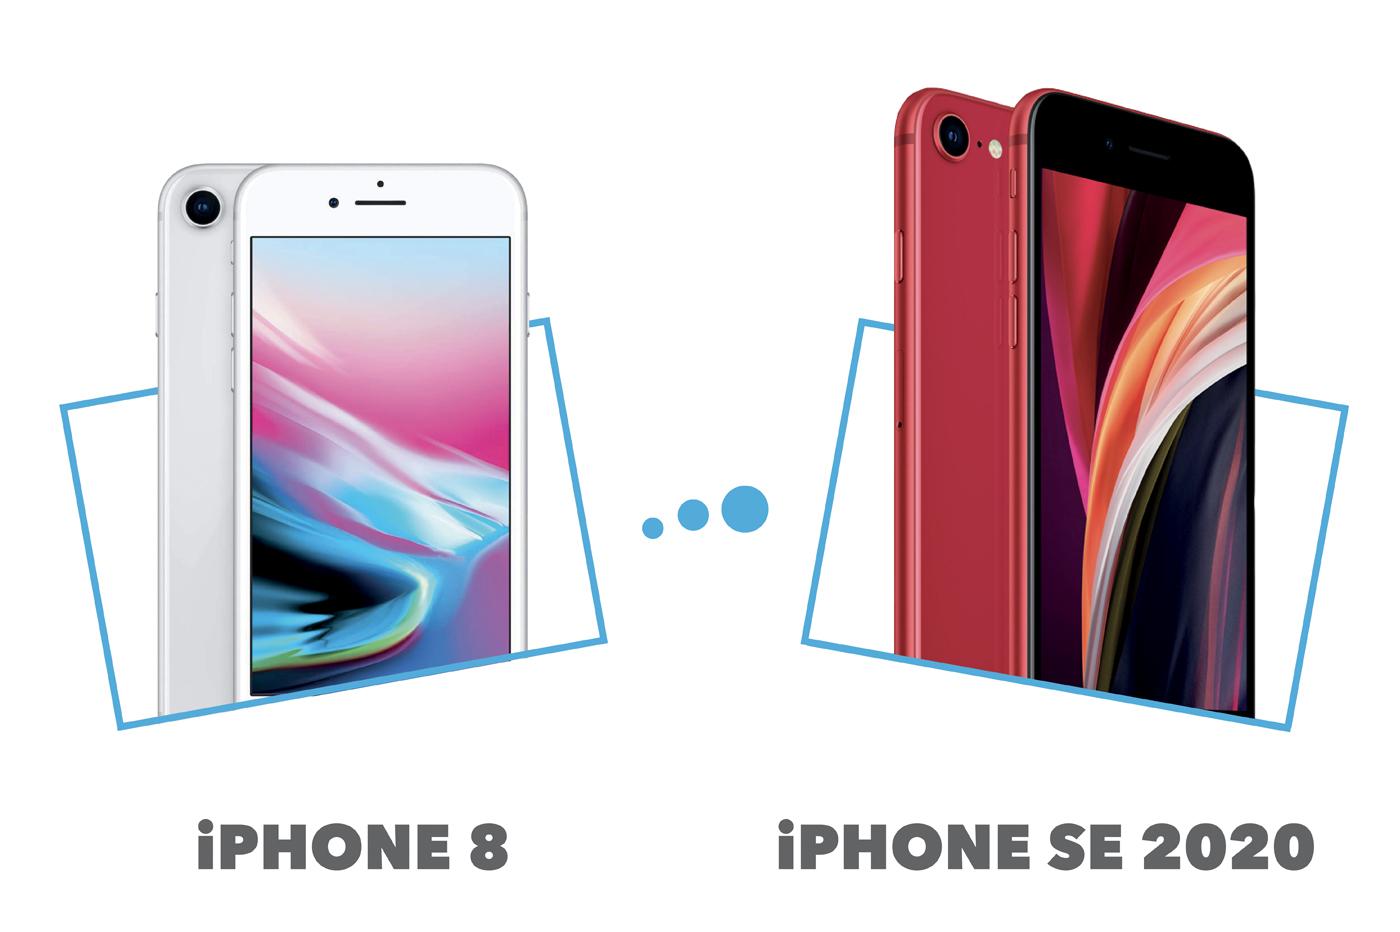 iPhone SE vs iPhone 8